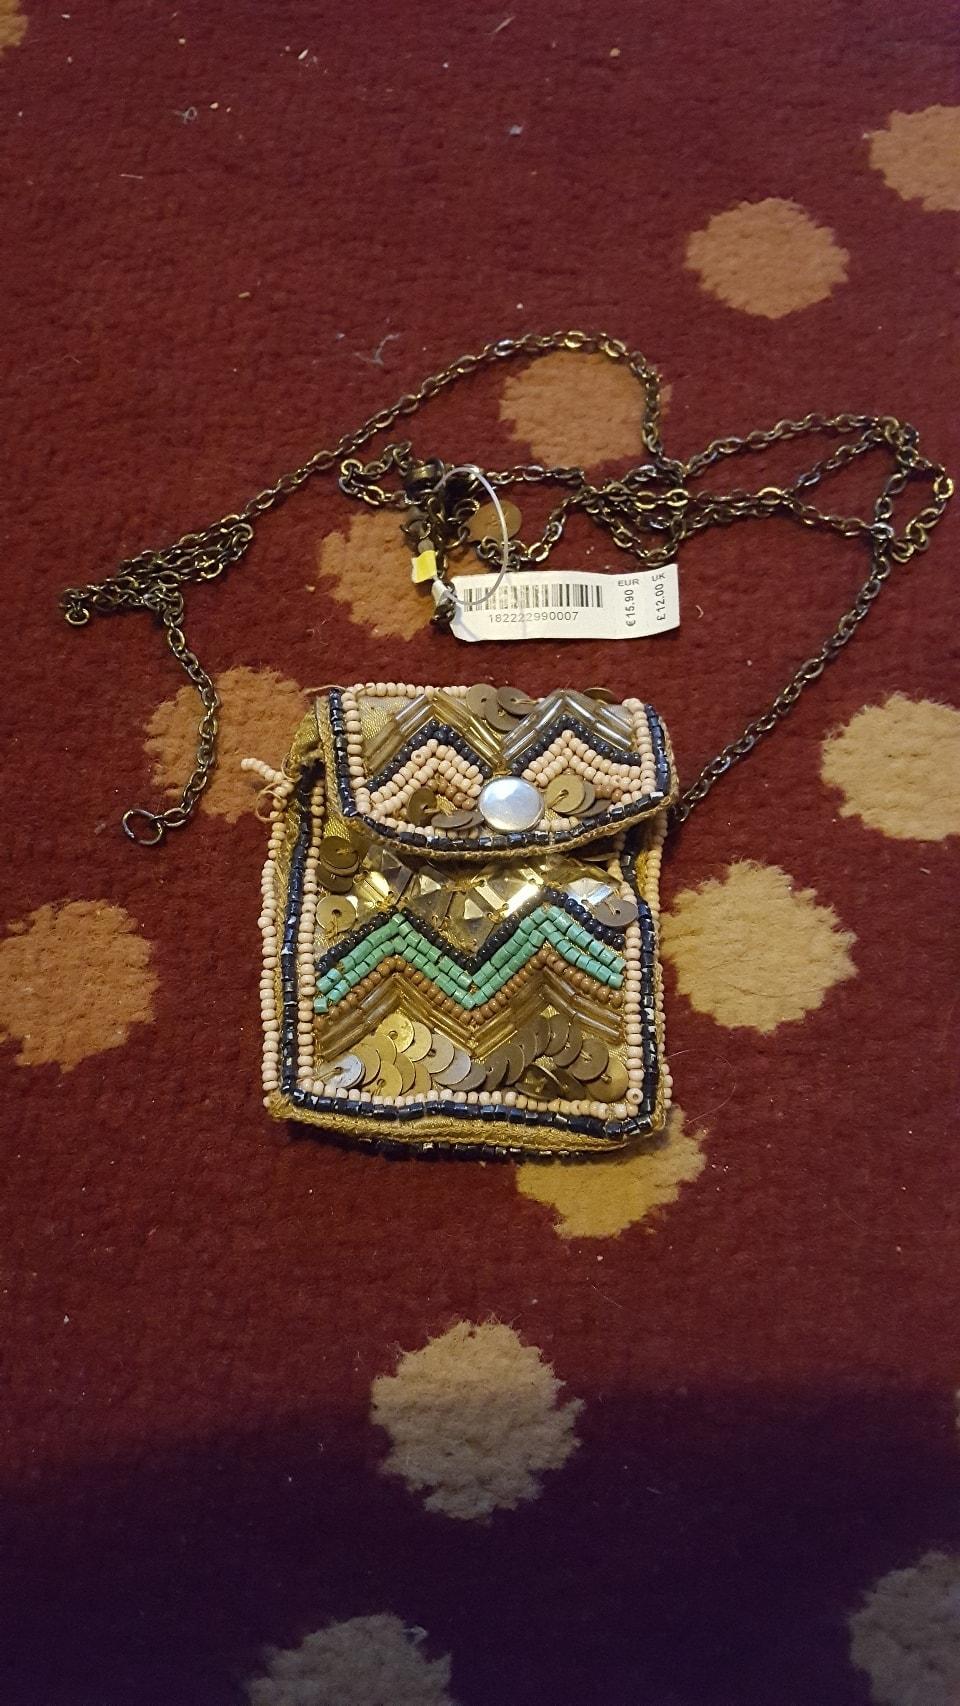 Jewelled necklace purse